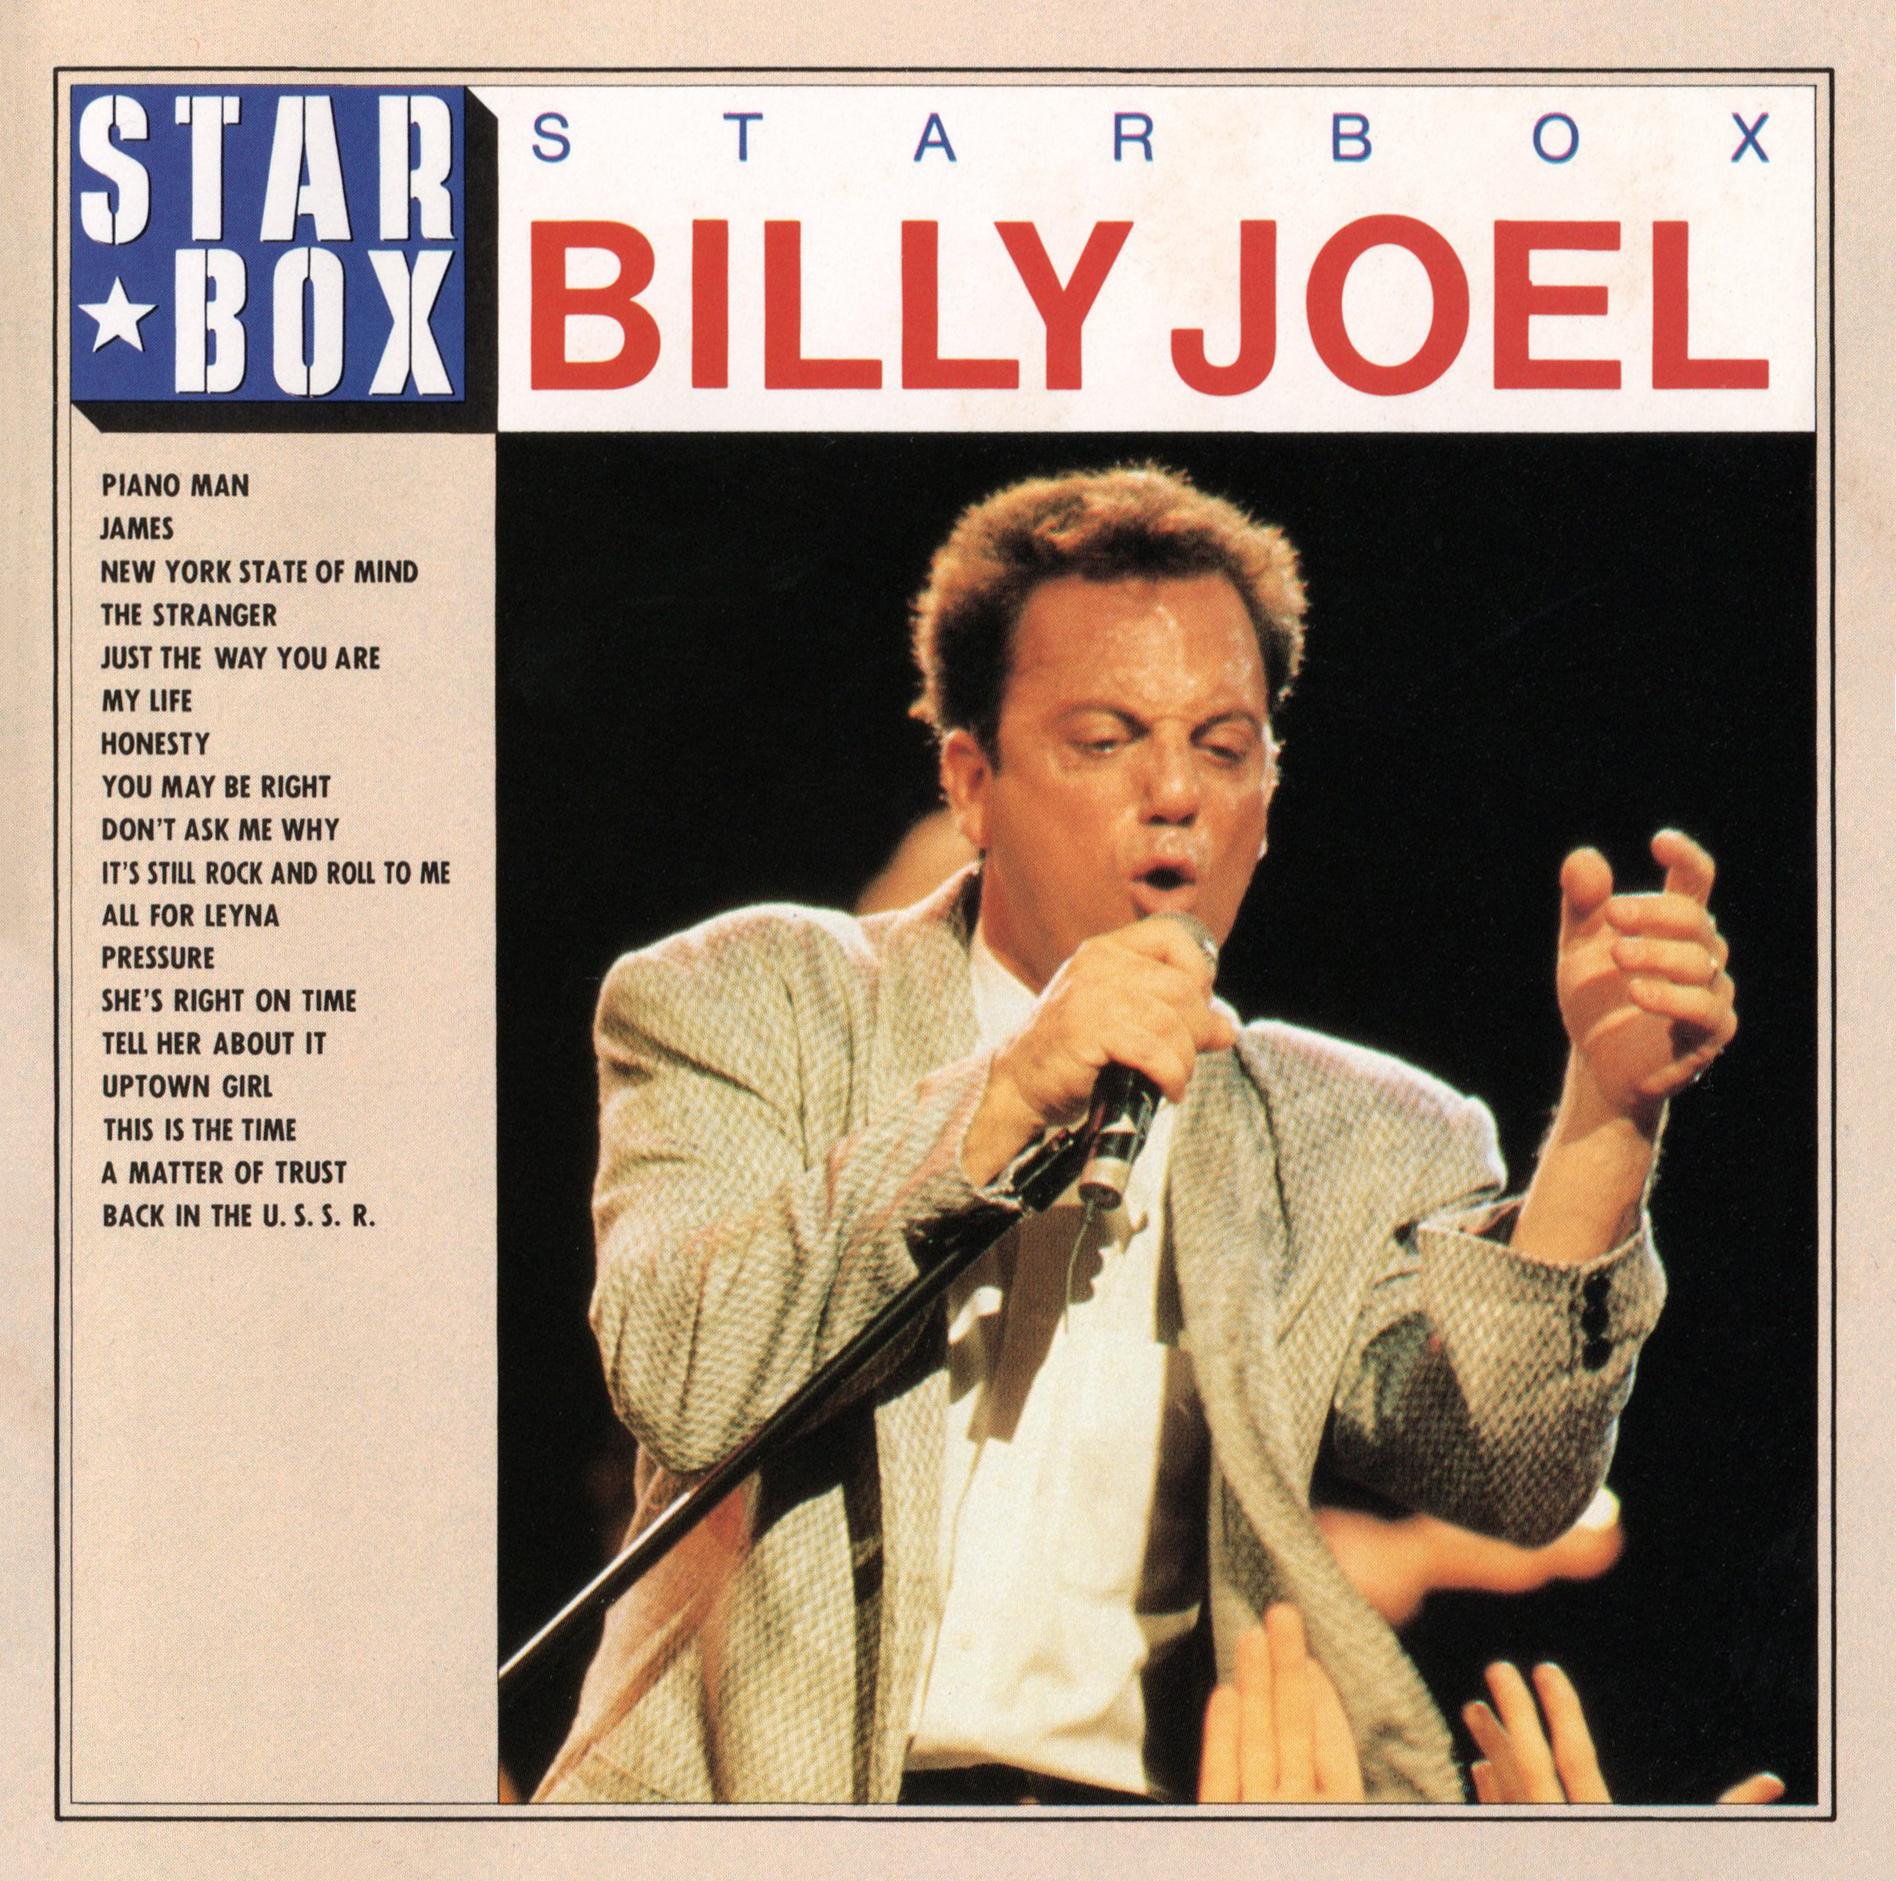 Billy Joel (ビリー・ジョエル) コンピレーション・アルバム『STAR BOX (スター・ボックス)』(1988年8月26日発売) 高画質CDジャケット画像